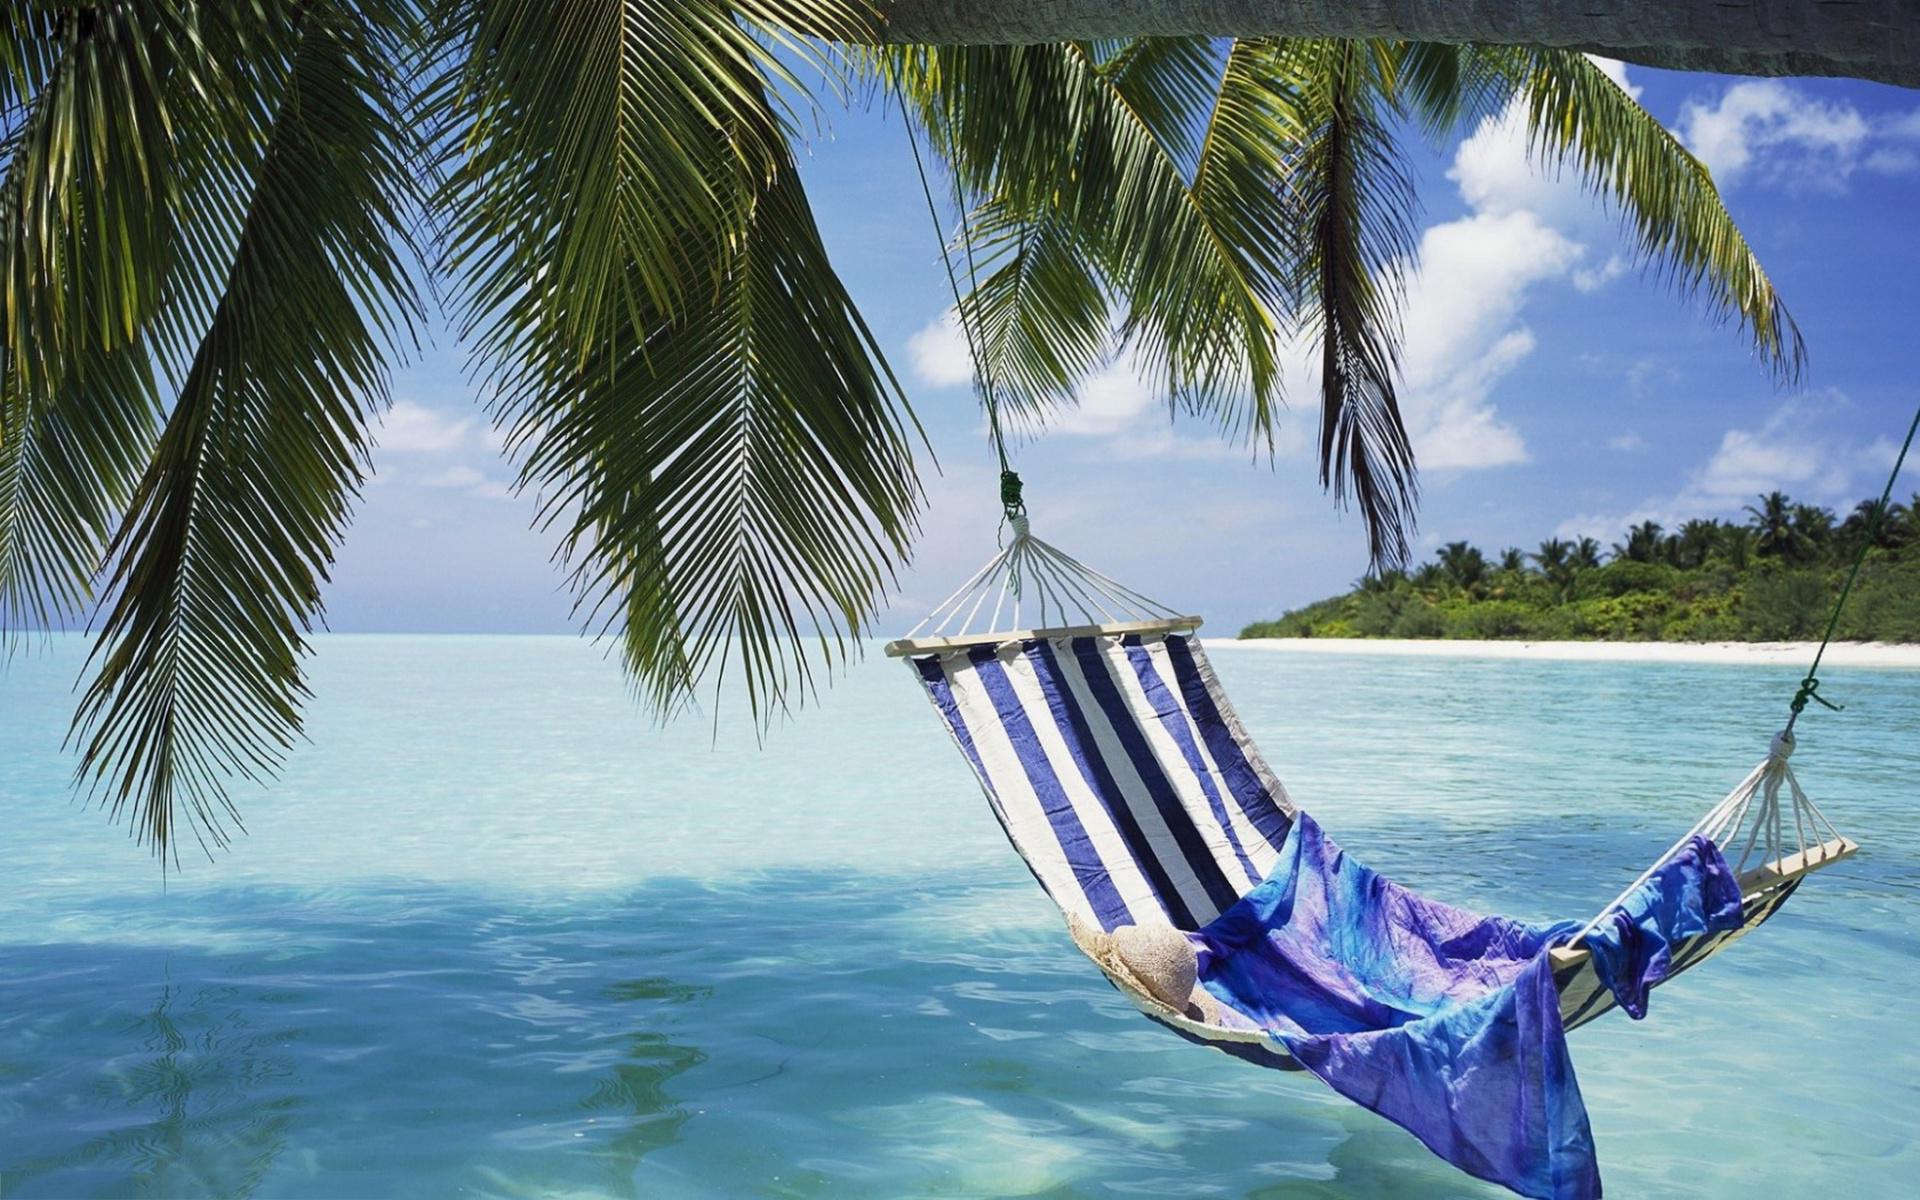 Hammock under palms